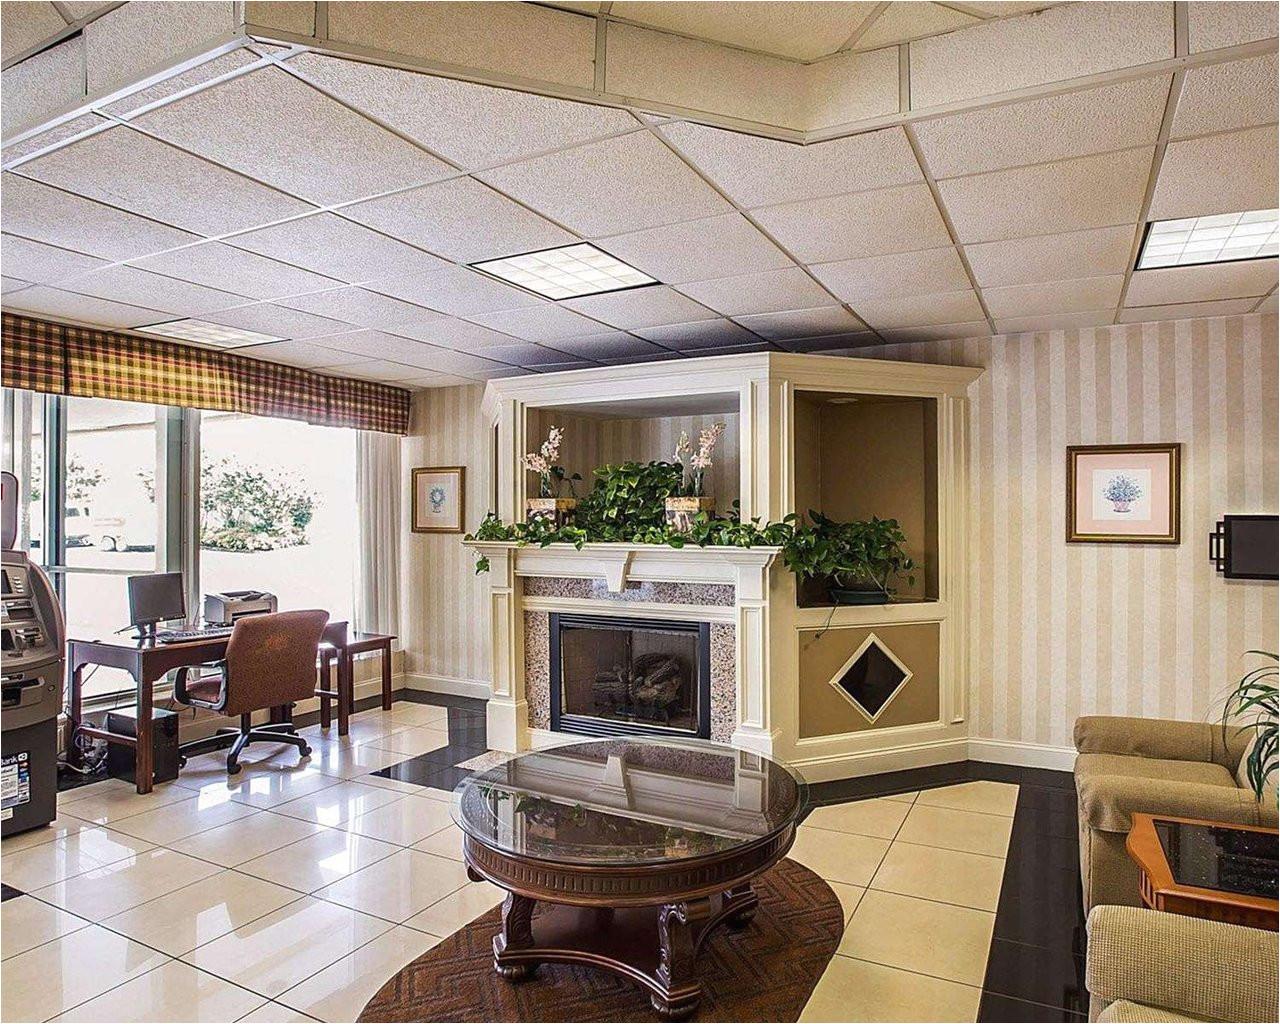 rodeway inn millennium updated 2018 prices reviews photos greenville sc hotel tripadvisor